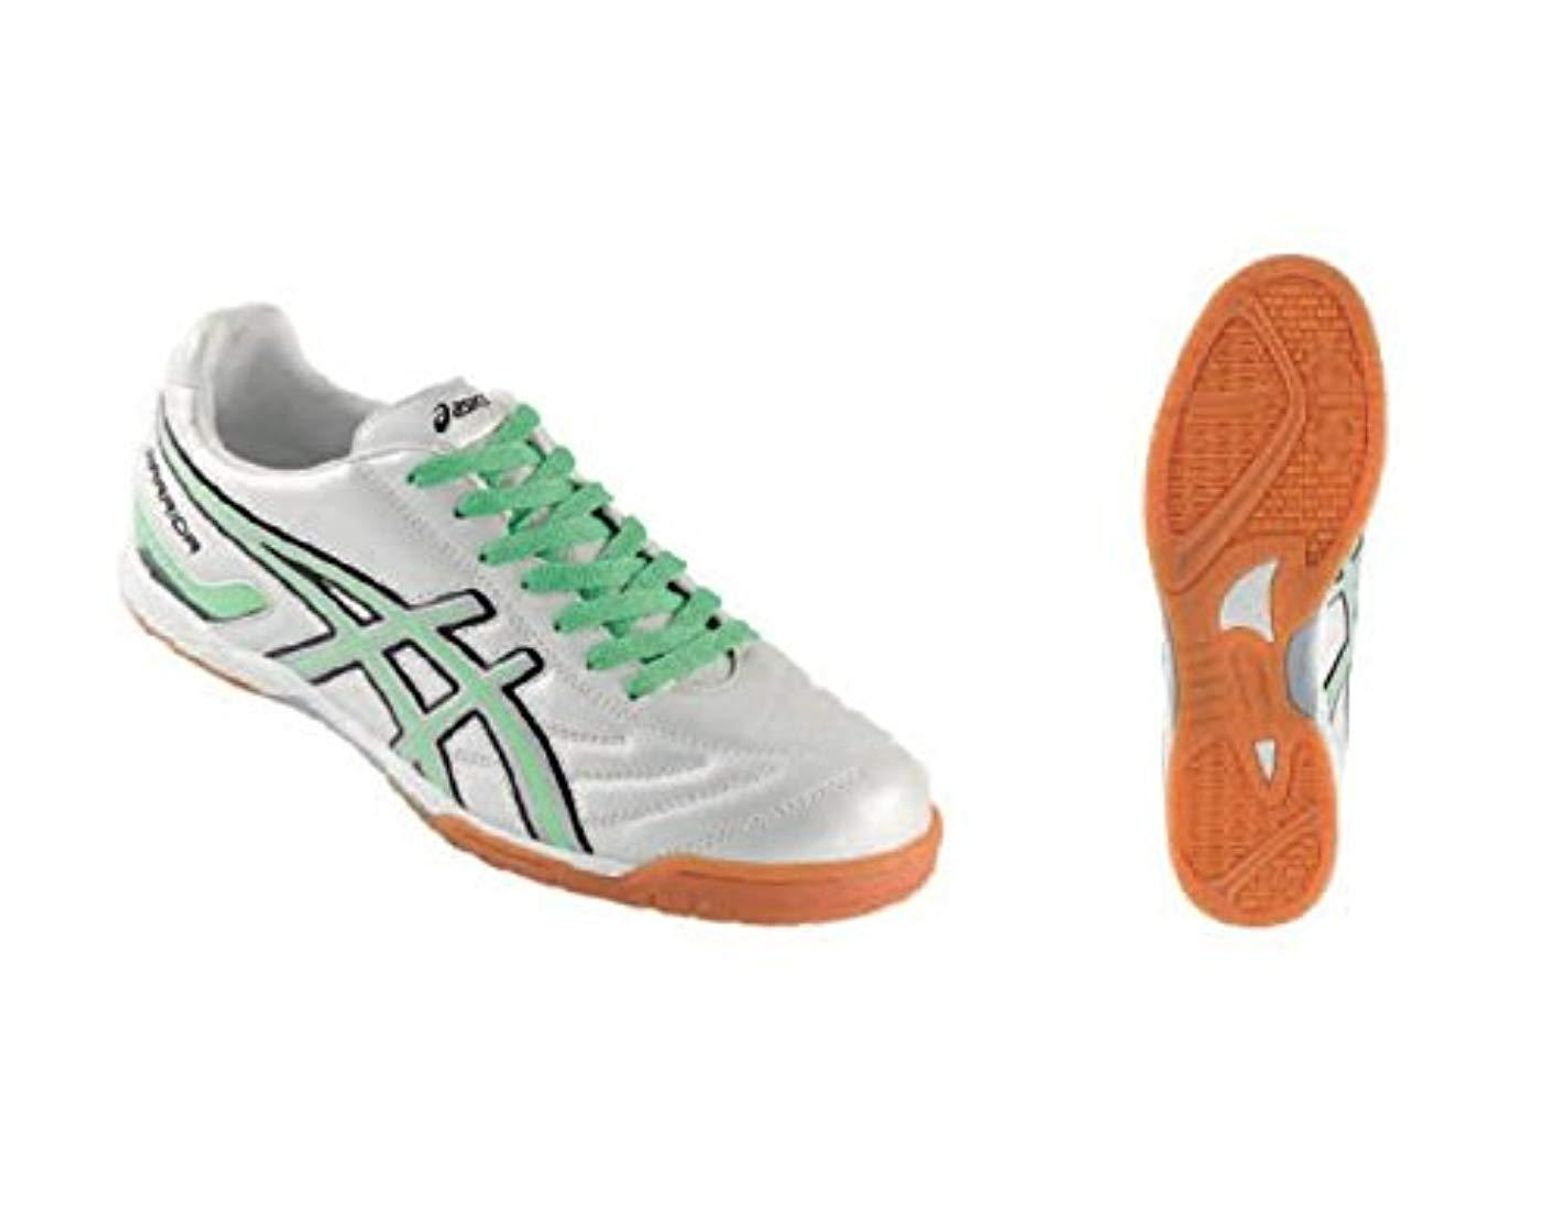 separation shoes d6f9a 8d7a2 Men's Scarpe Calcetto Uomo Tecnosoccer Warrior Indoor Bianco Verde Fluo  Fsg988